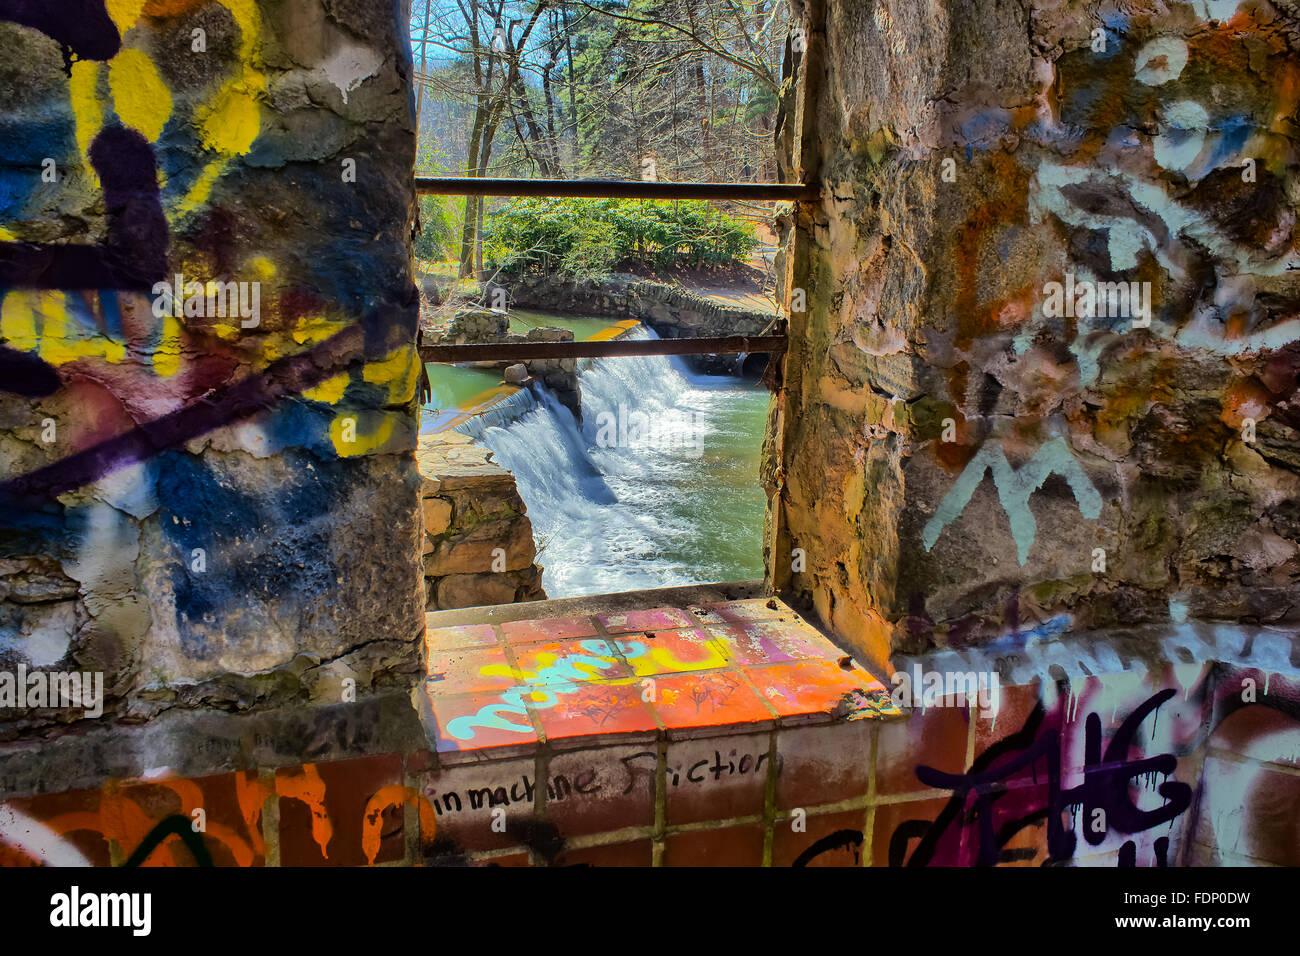 Lullwater Waterfall Spillway Through a window Stock Photo